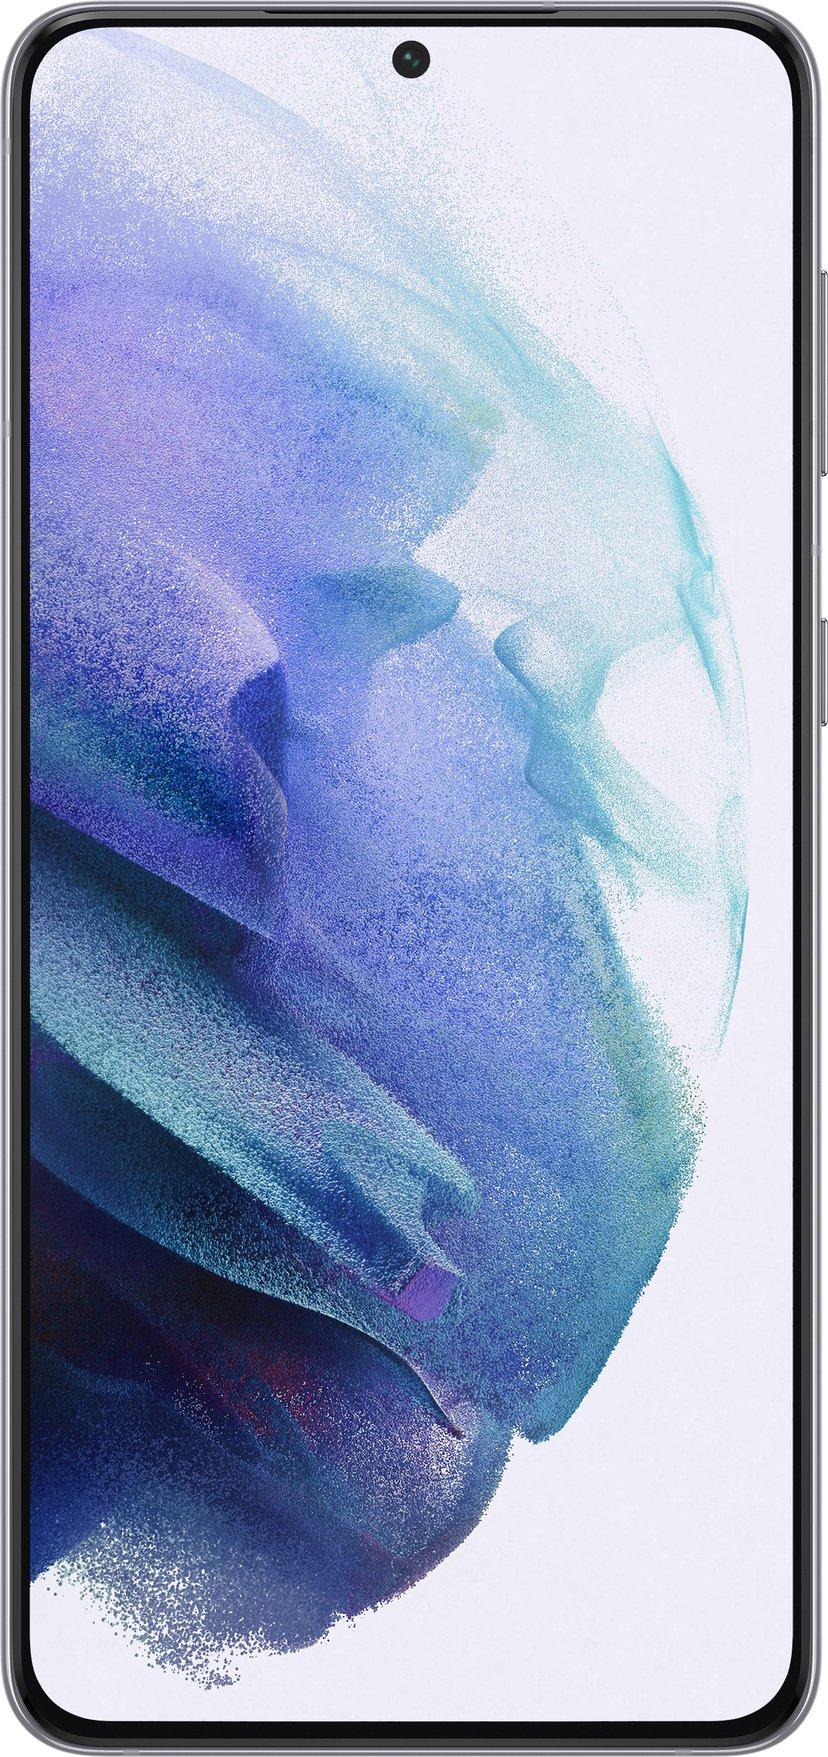 Samsung Galaxy S21+ 5G 128GB Dual-SIM Phantom silver